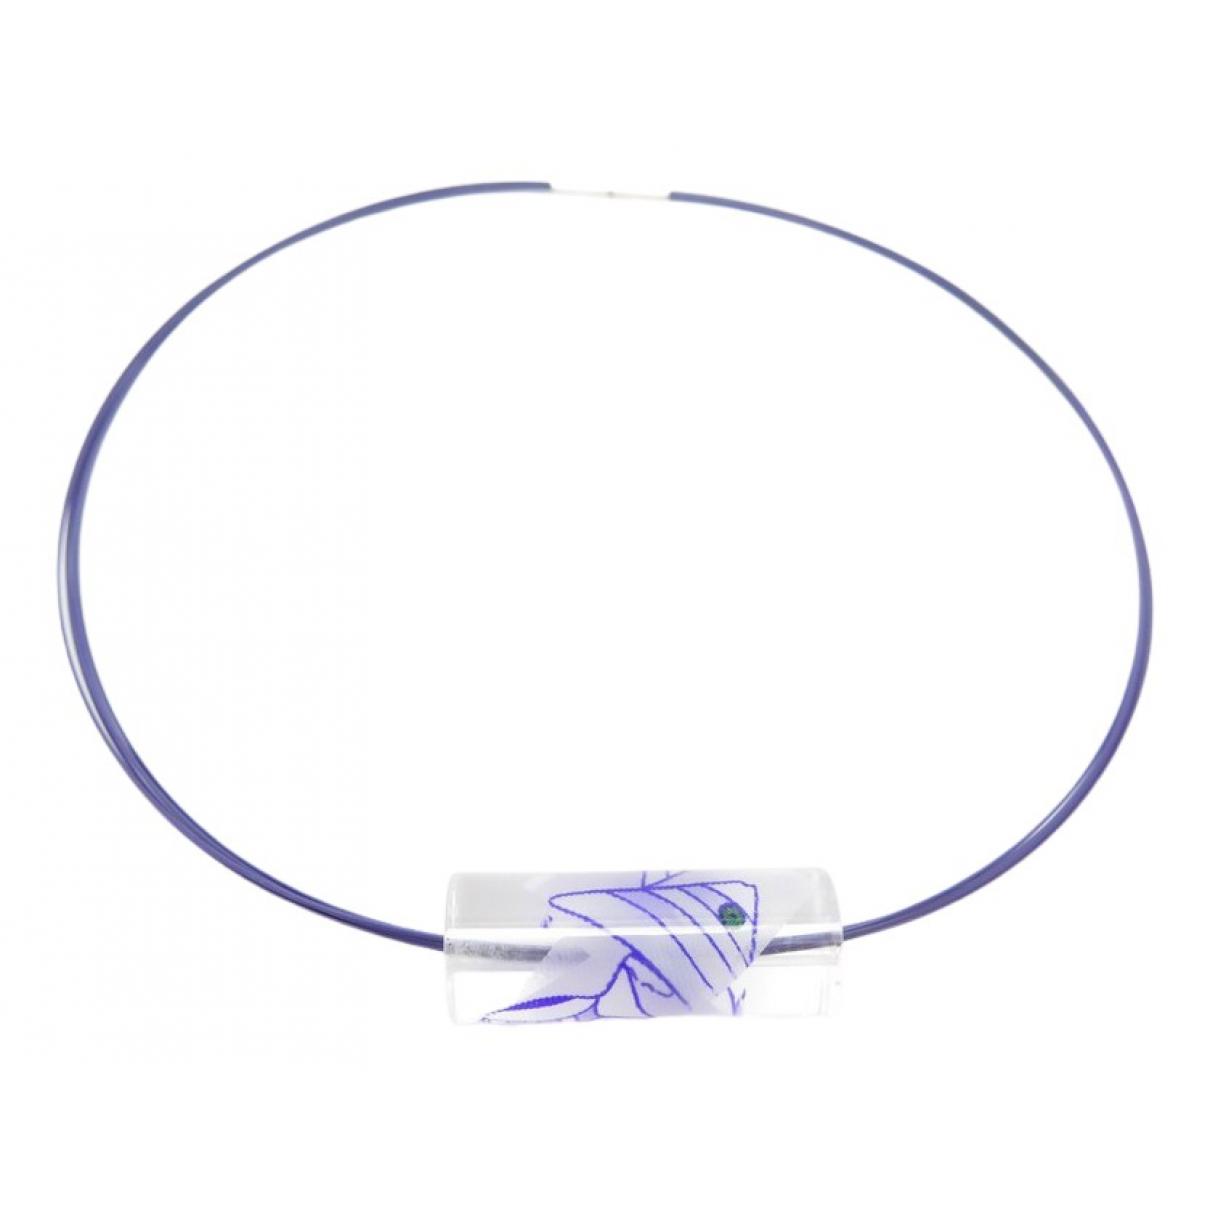 Collar Hermes